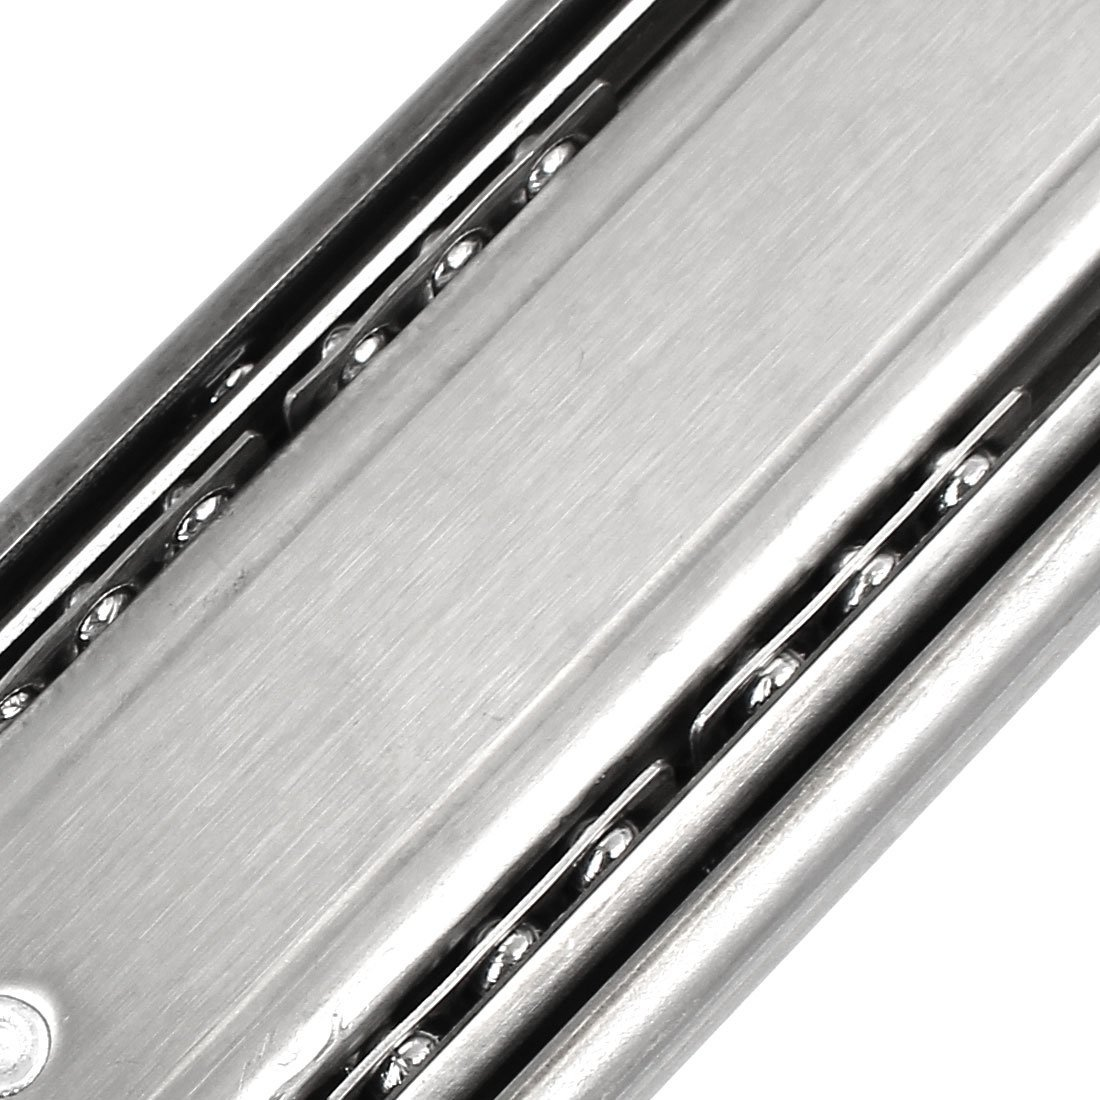 eDealMax 18 pulgadas Longitud 45 mm Anchura 3-Sección cojinete de bolas 2pcs Cajones Rail - - Amazon.com